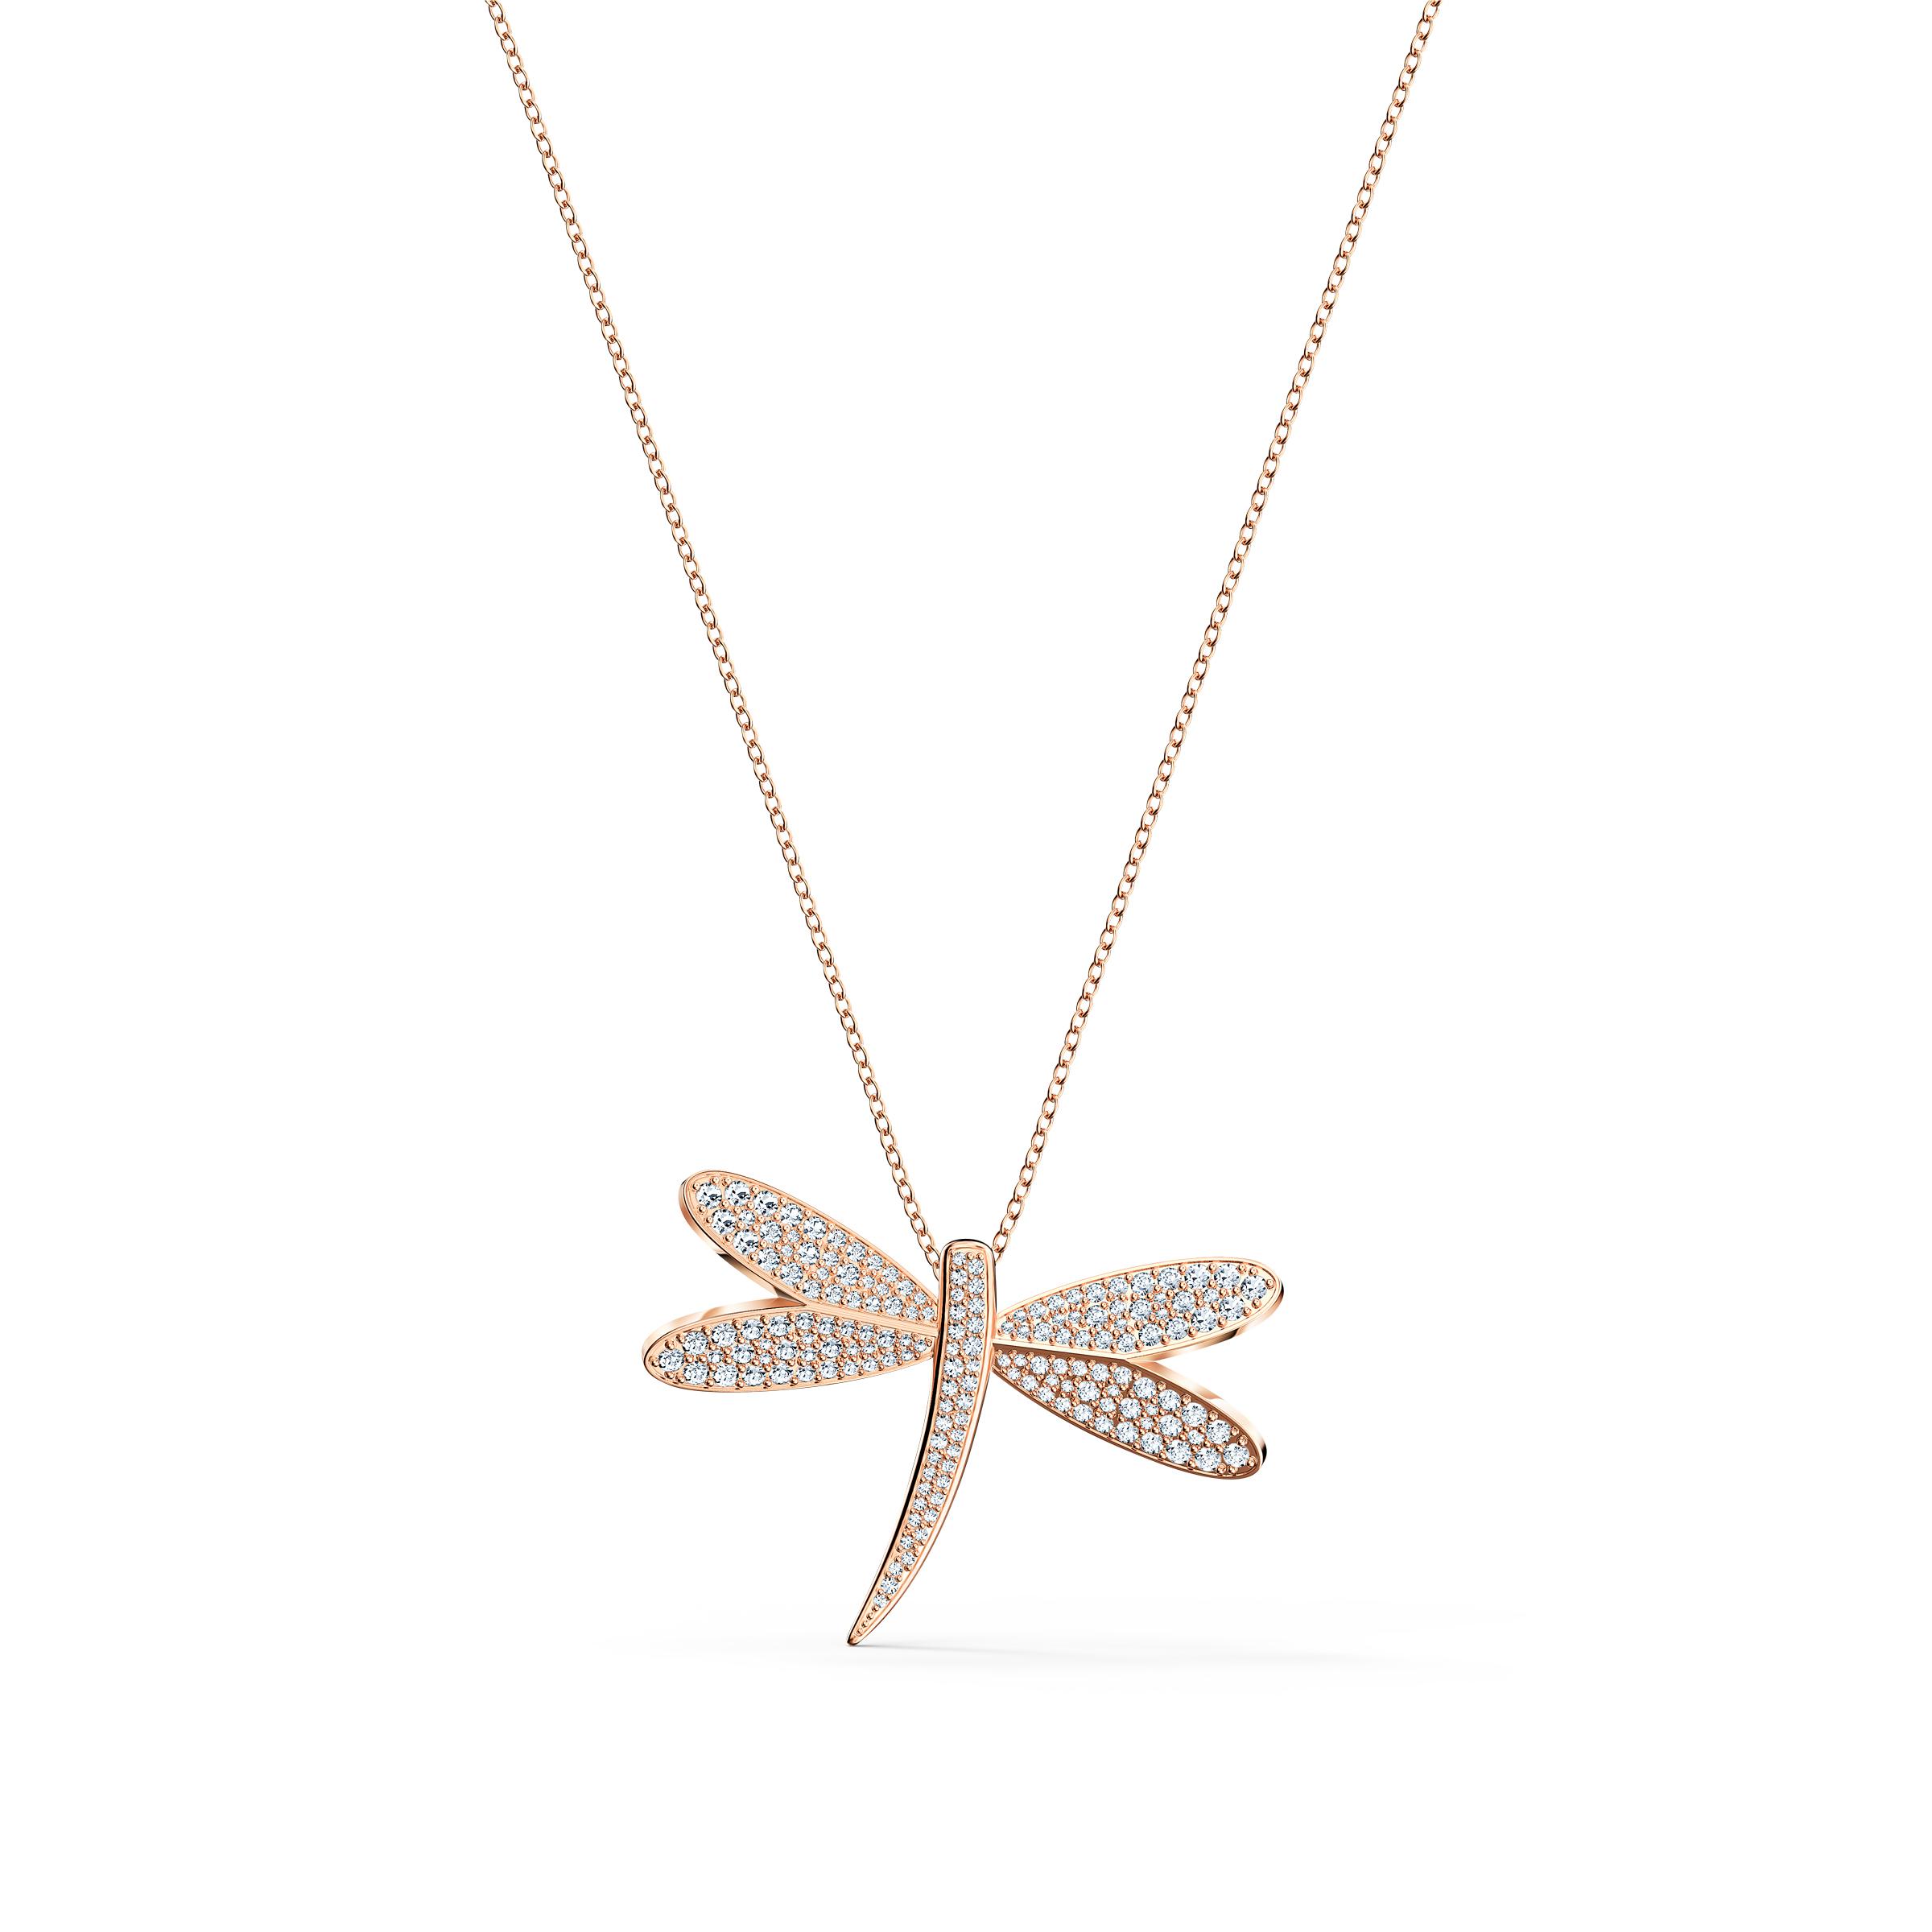 Collier Eternal Flower, blanc, métal doré rose, Swarovski